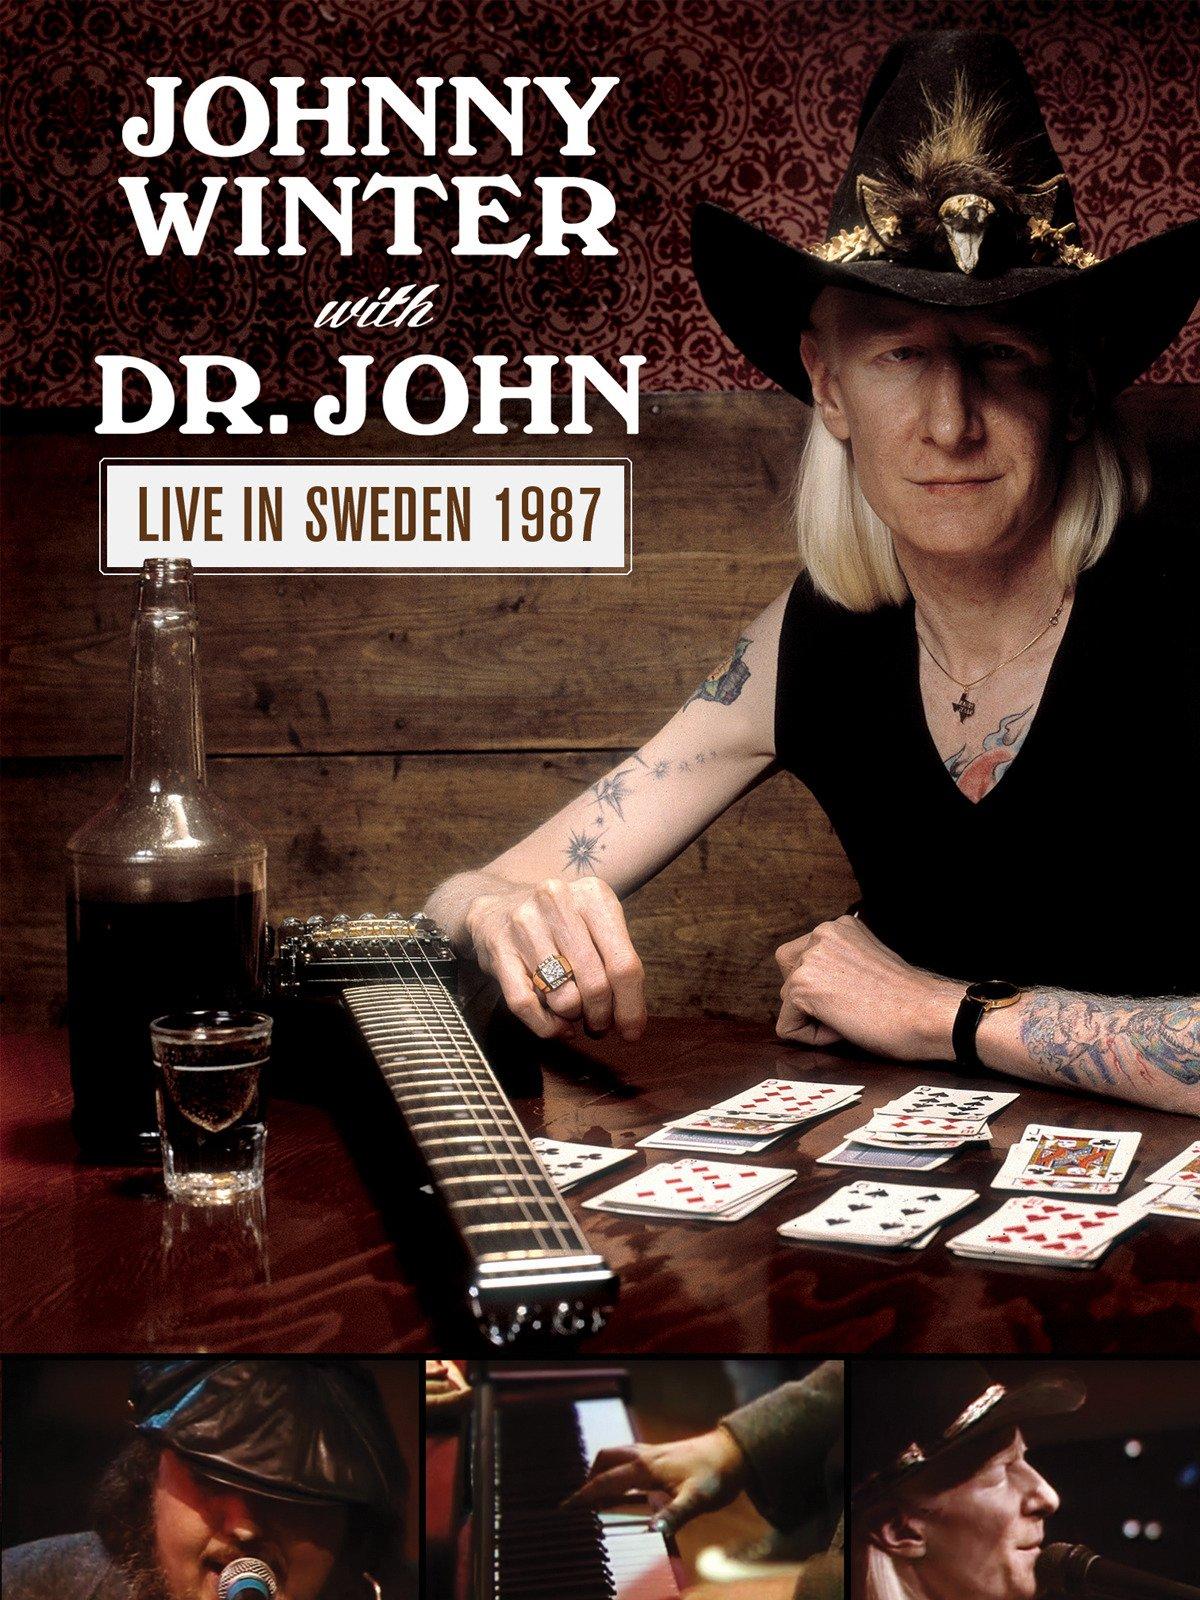 Johnny Winter & Dr. John